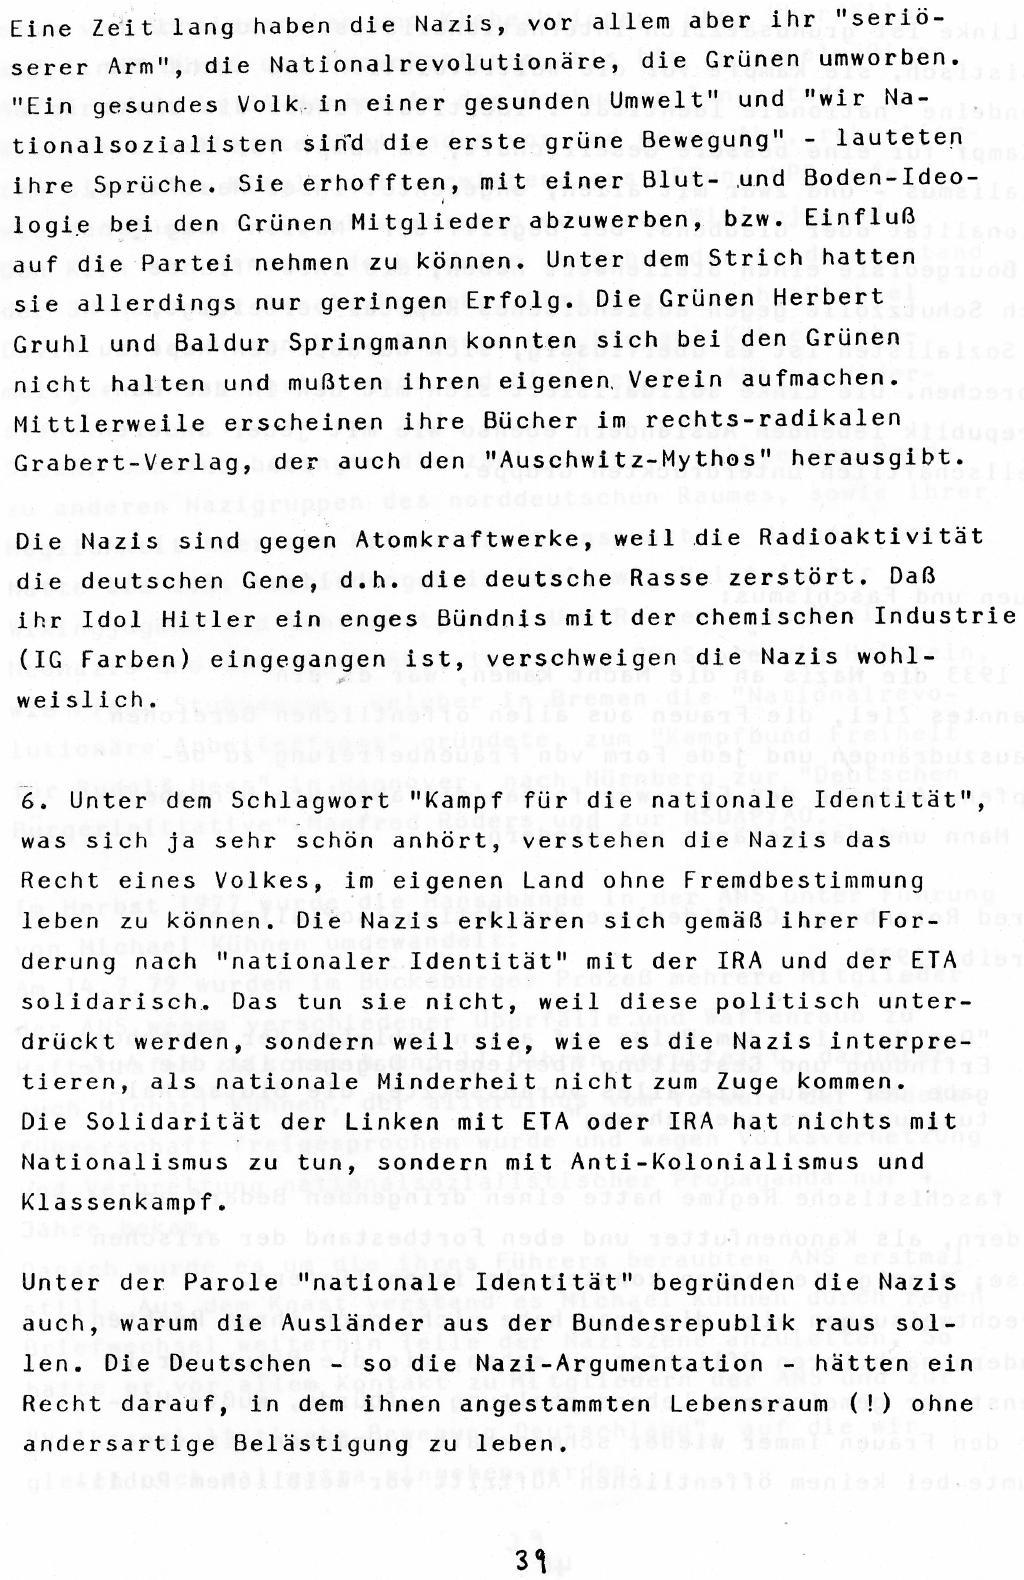 Berlin_1983_Autonome_Gruppen_Faschismus_im_Kapitalismus_39